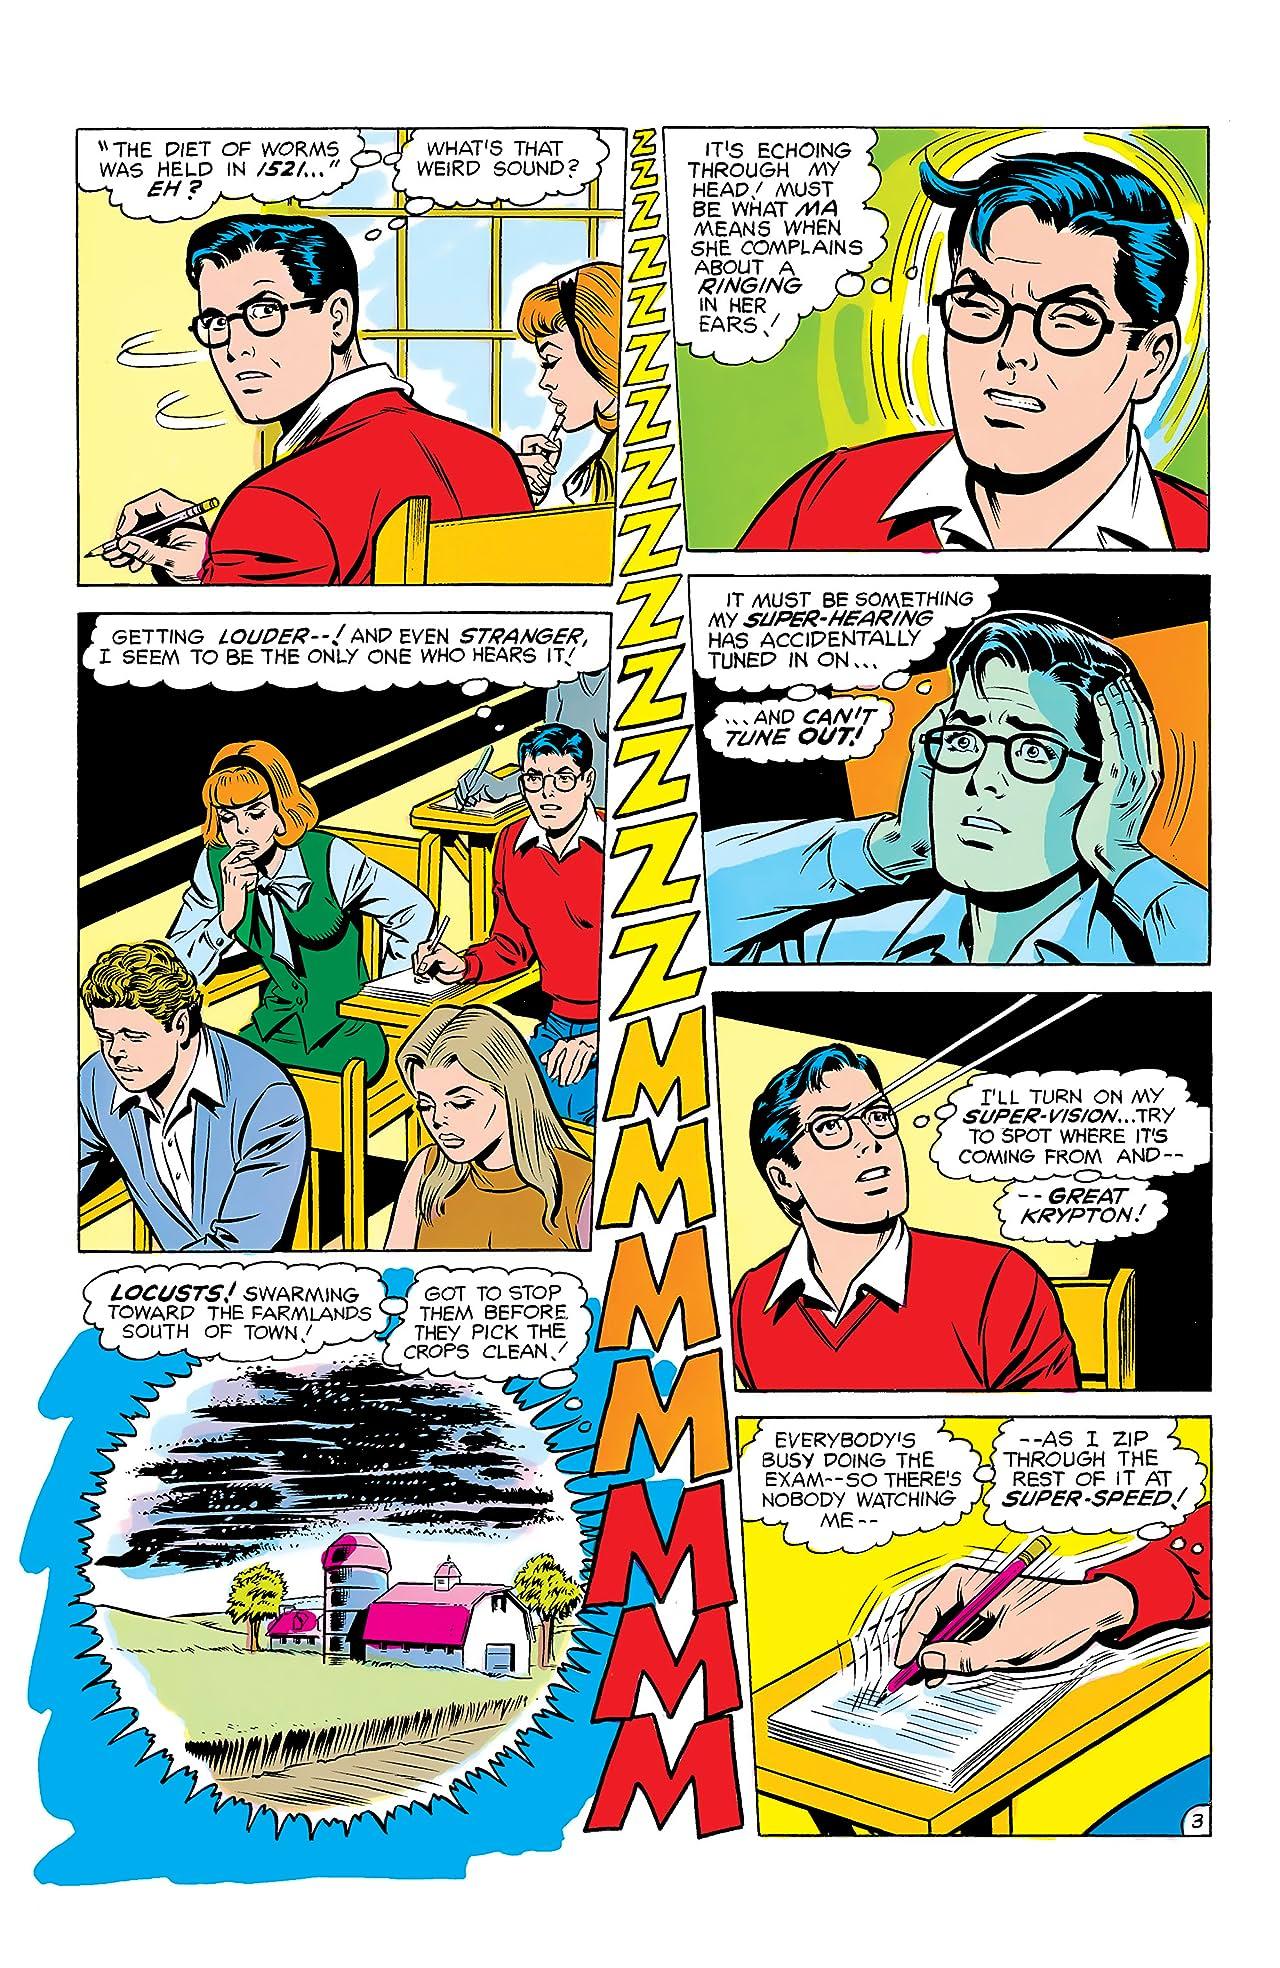 New Adventures of Superboy (1980-1984) #34